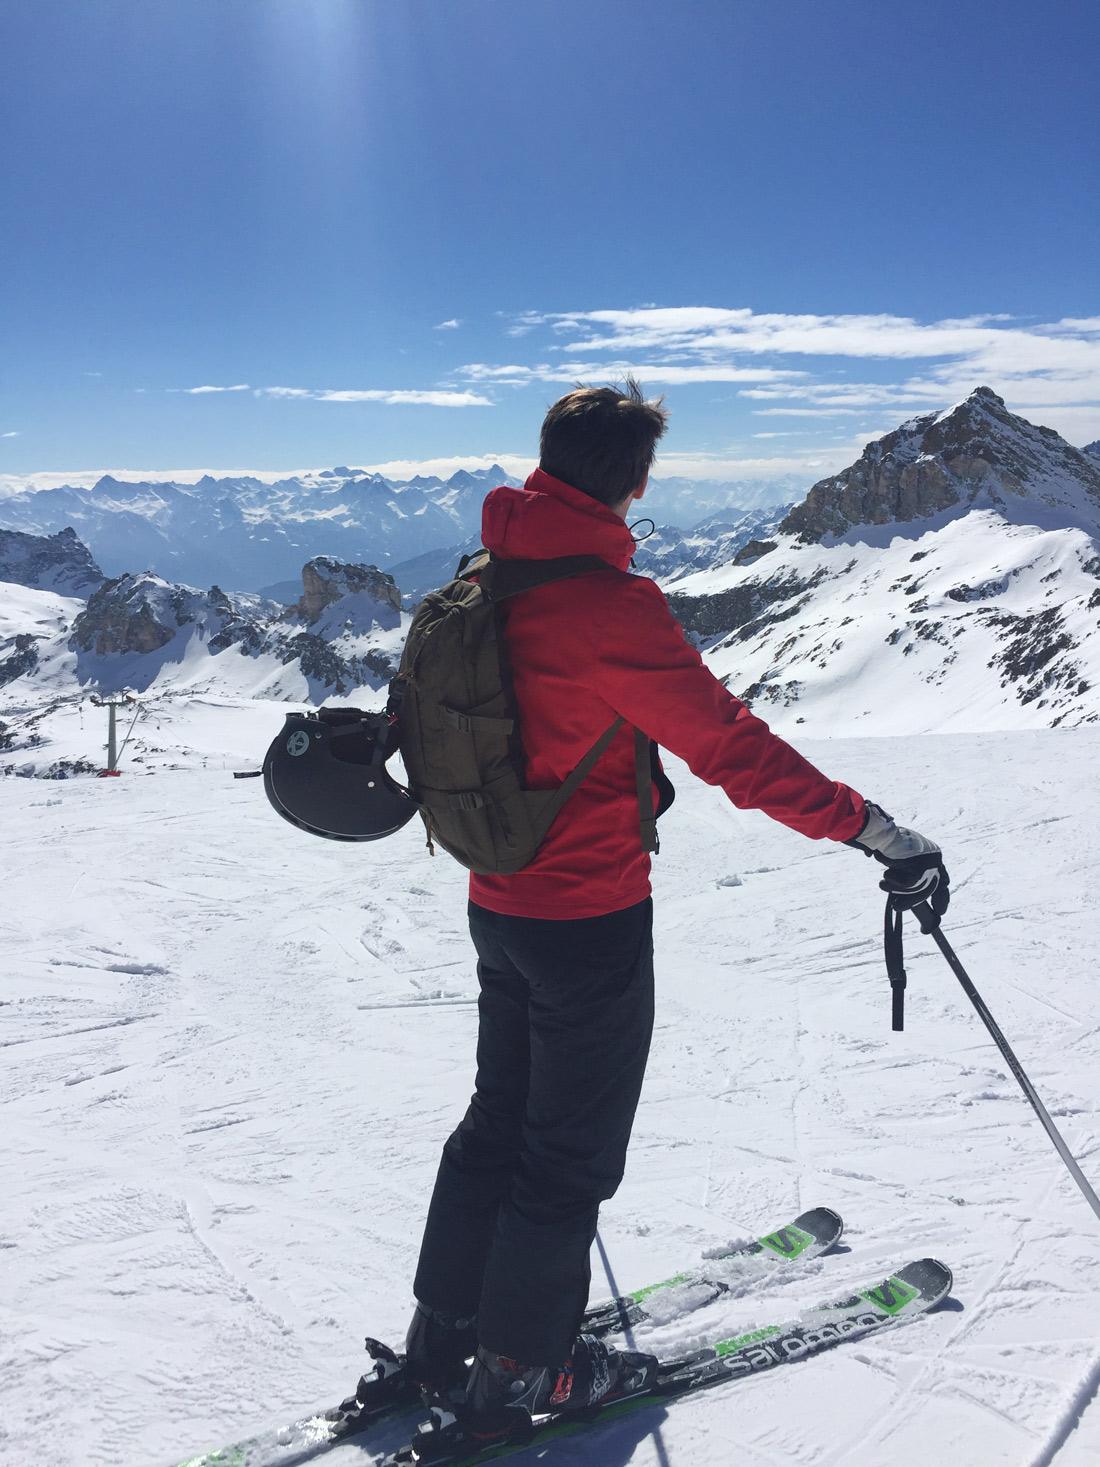 Bag-at-you---fashion-blog---Postcard-from-Zermatt---2